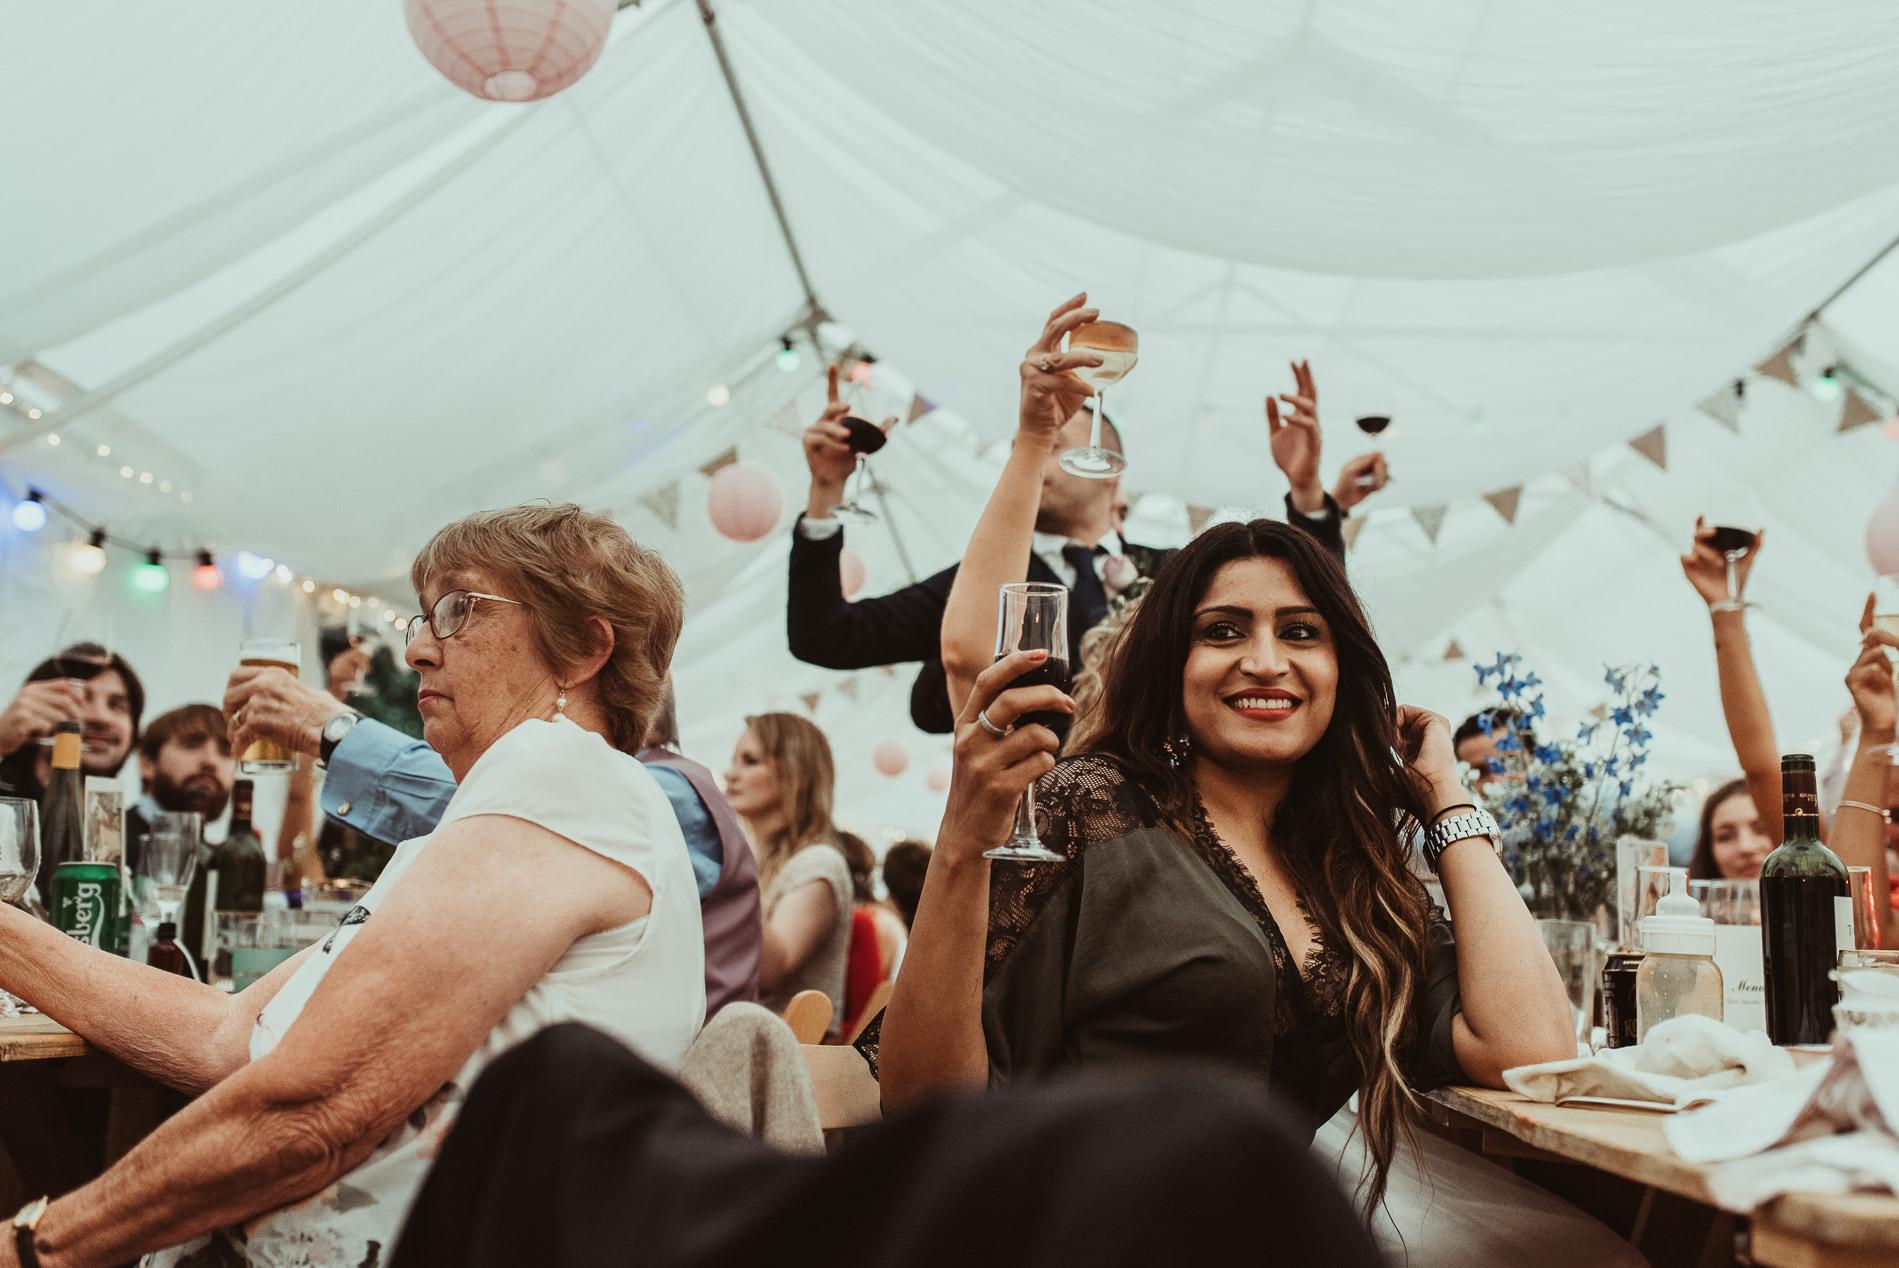 bohemian_wedding_lawshall_church_garden122